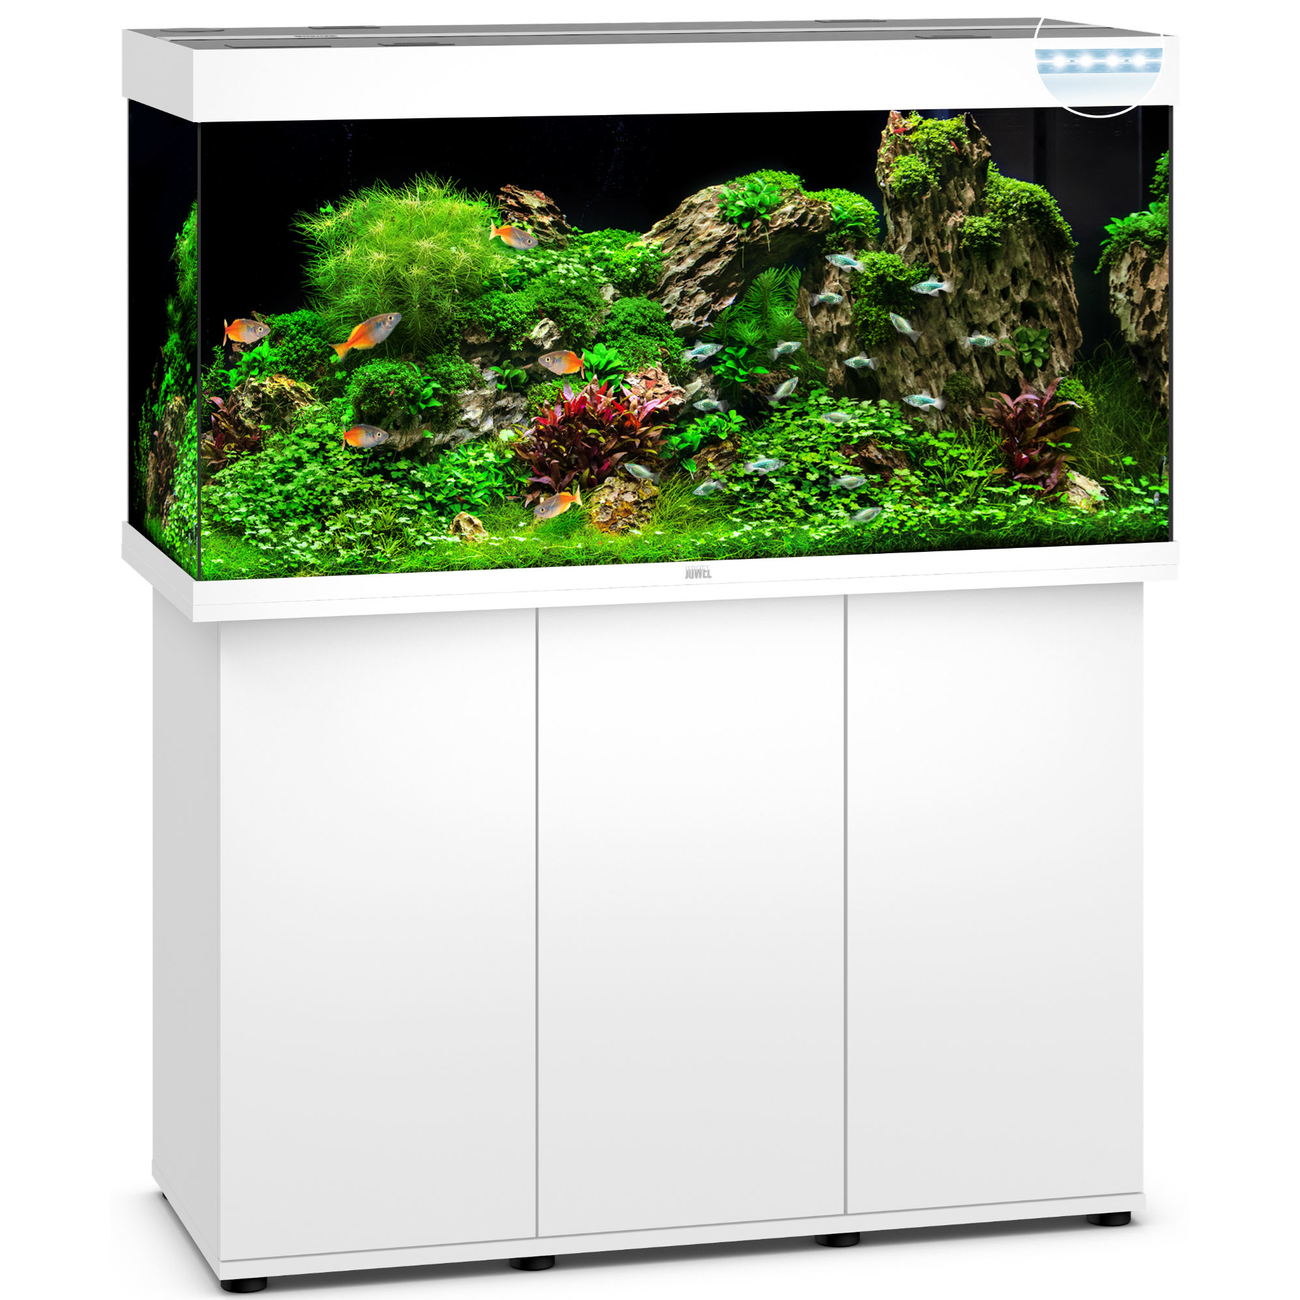 JUWEL RIO 350 LED Aquarium mit Unterschrank, 121 x 51 x (66+80) cm, weiß